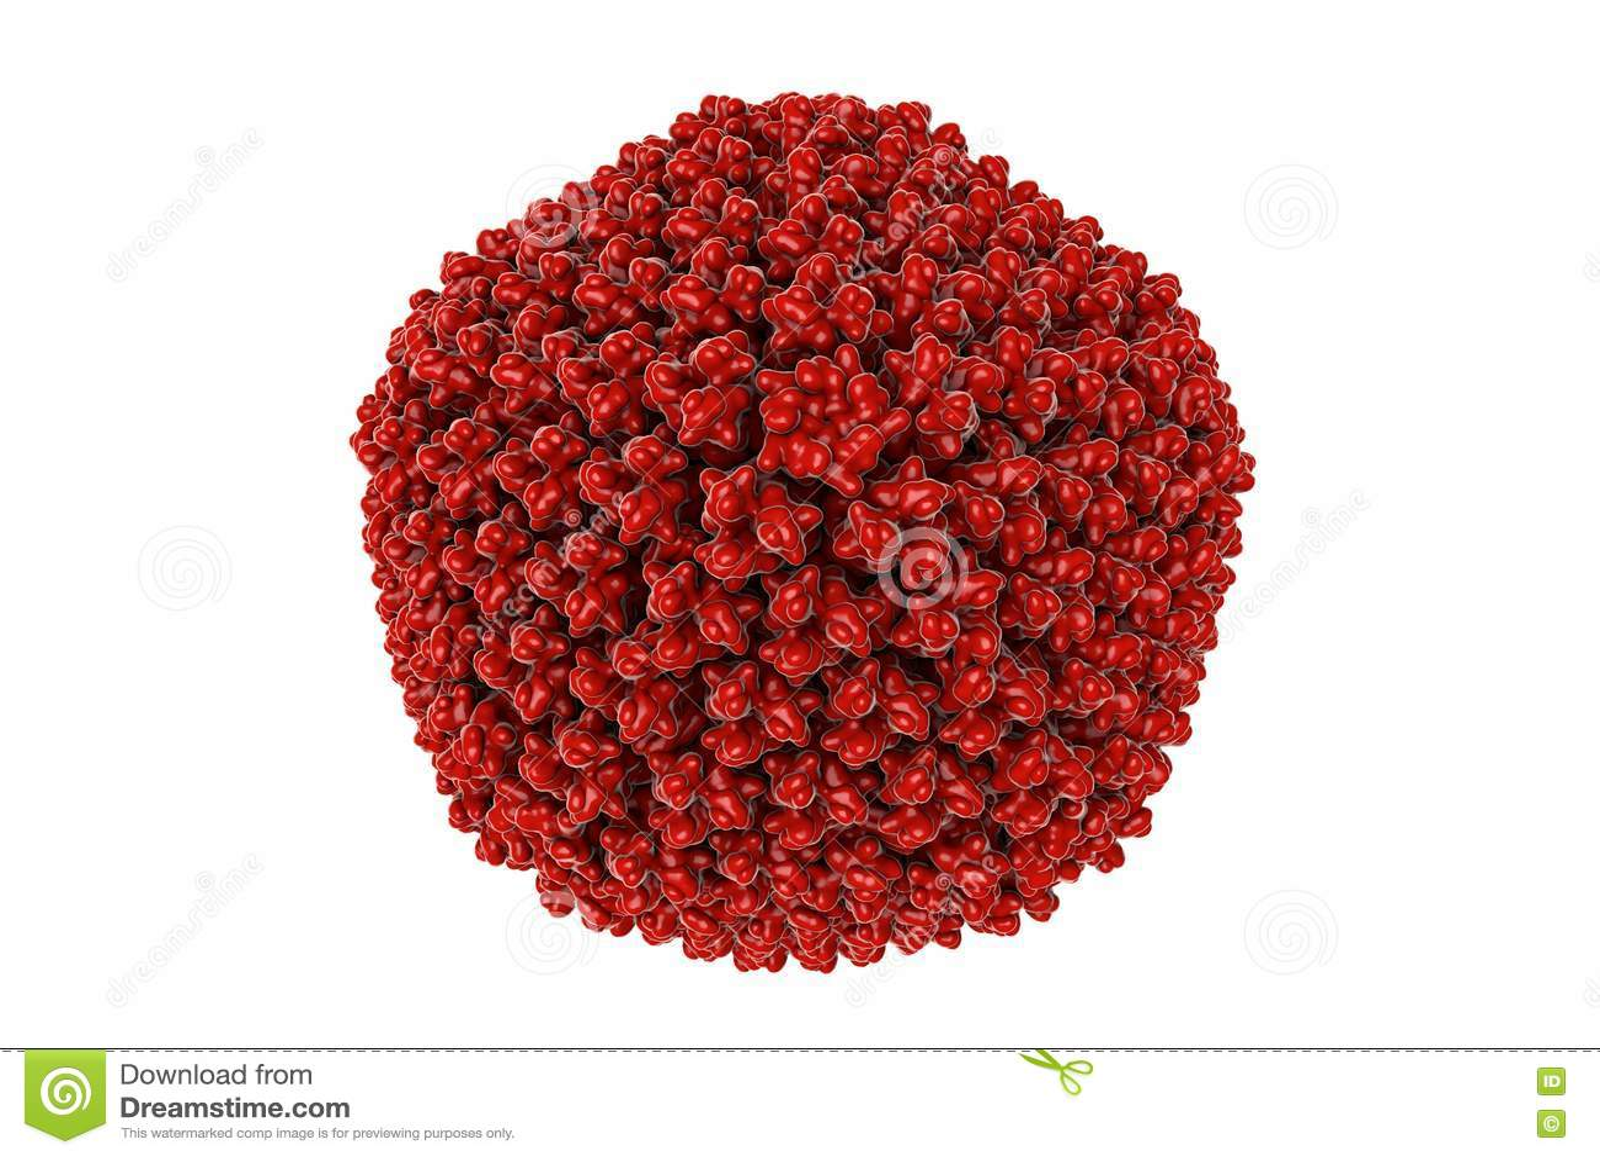 Adenovirus, un virus que causan infecciones respiratorias